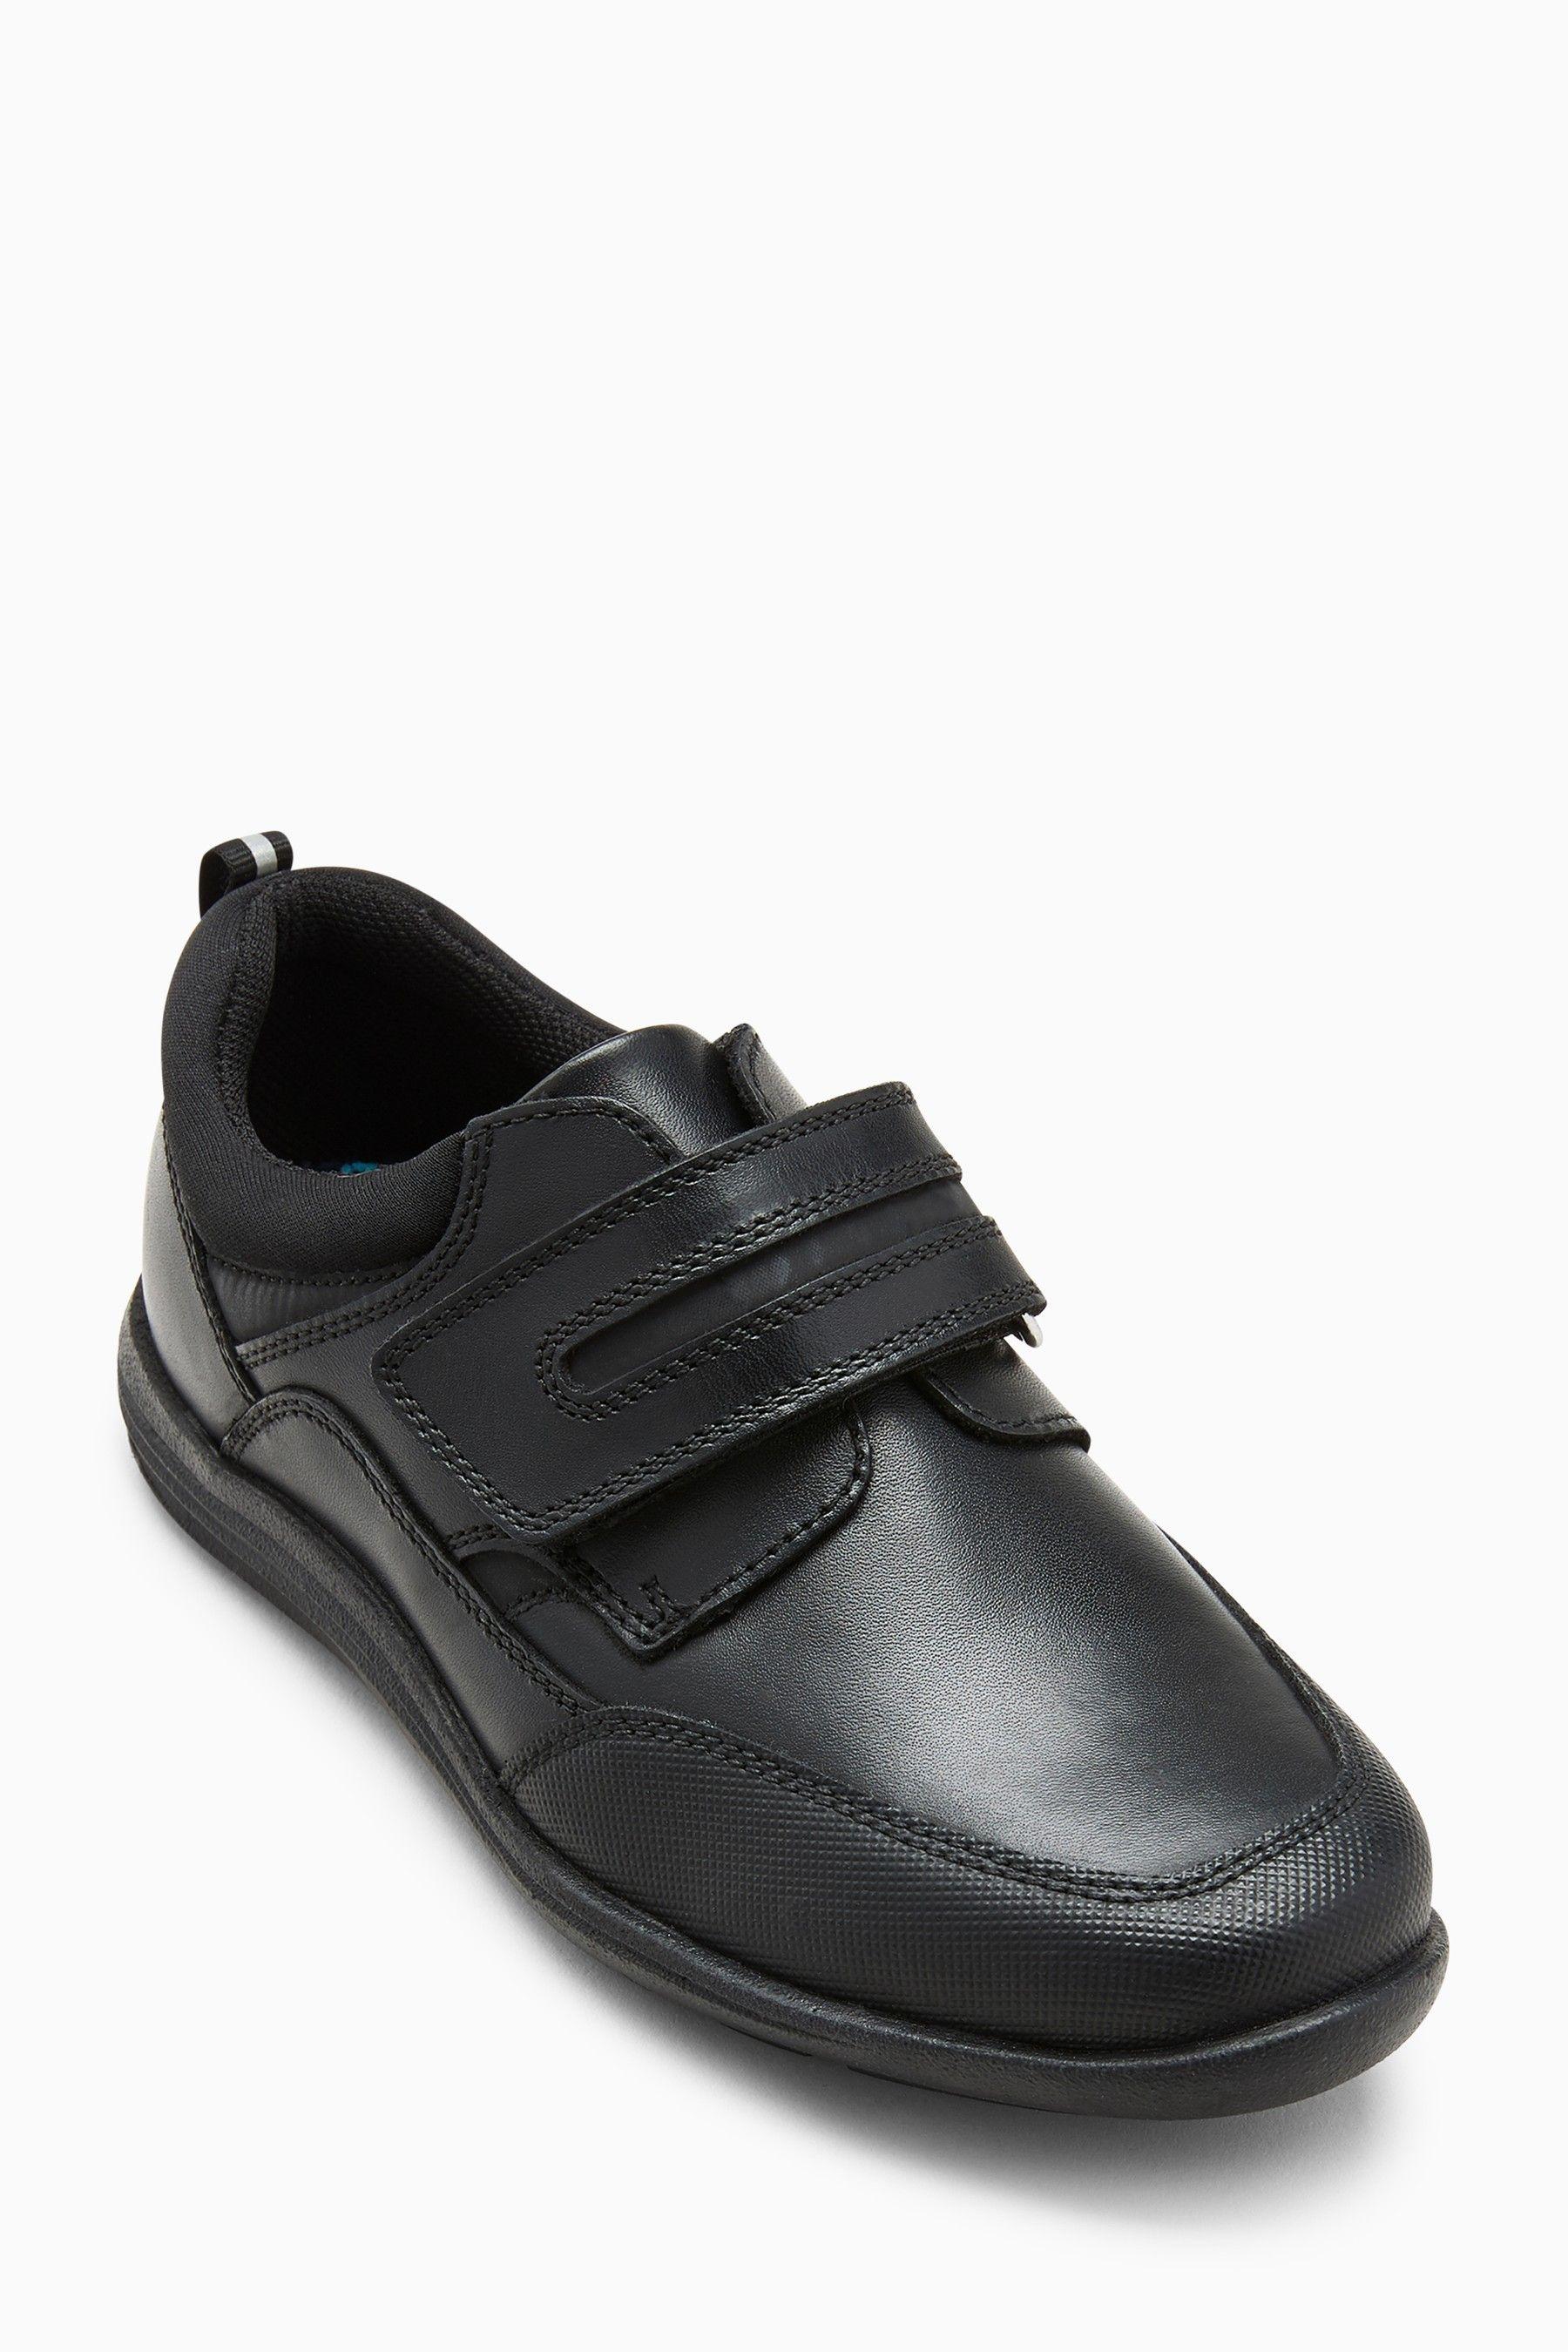 Boys Next Black Single Strap Leather